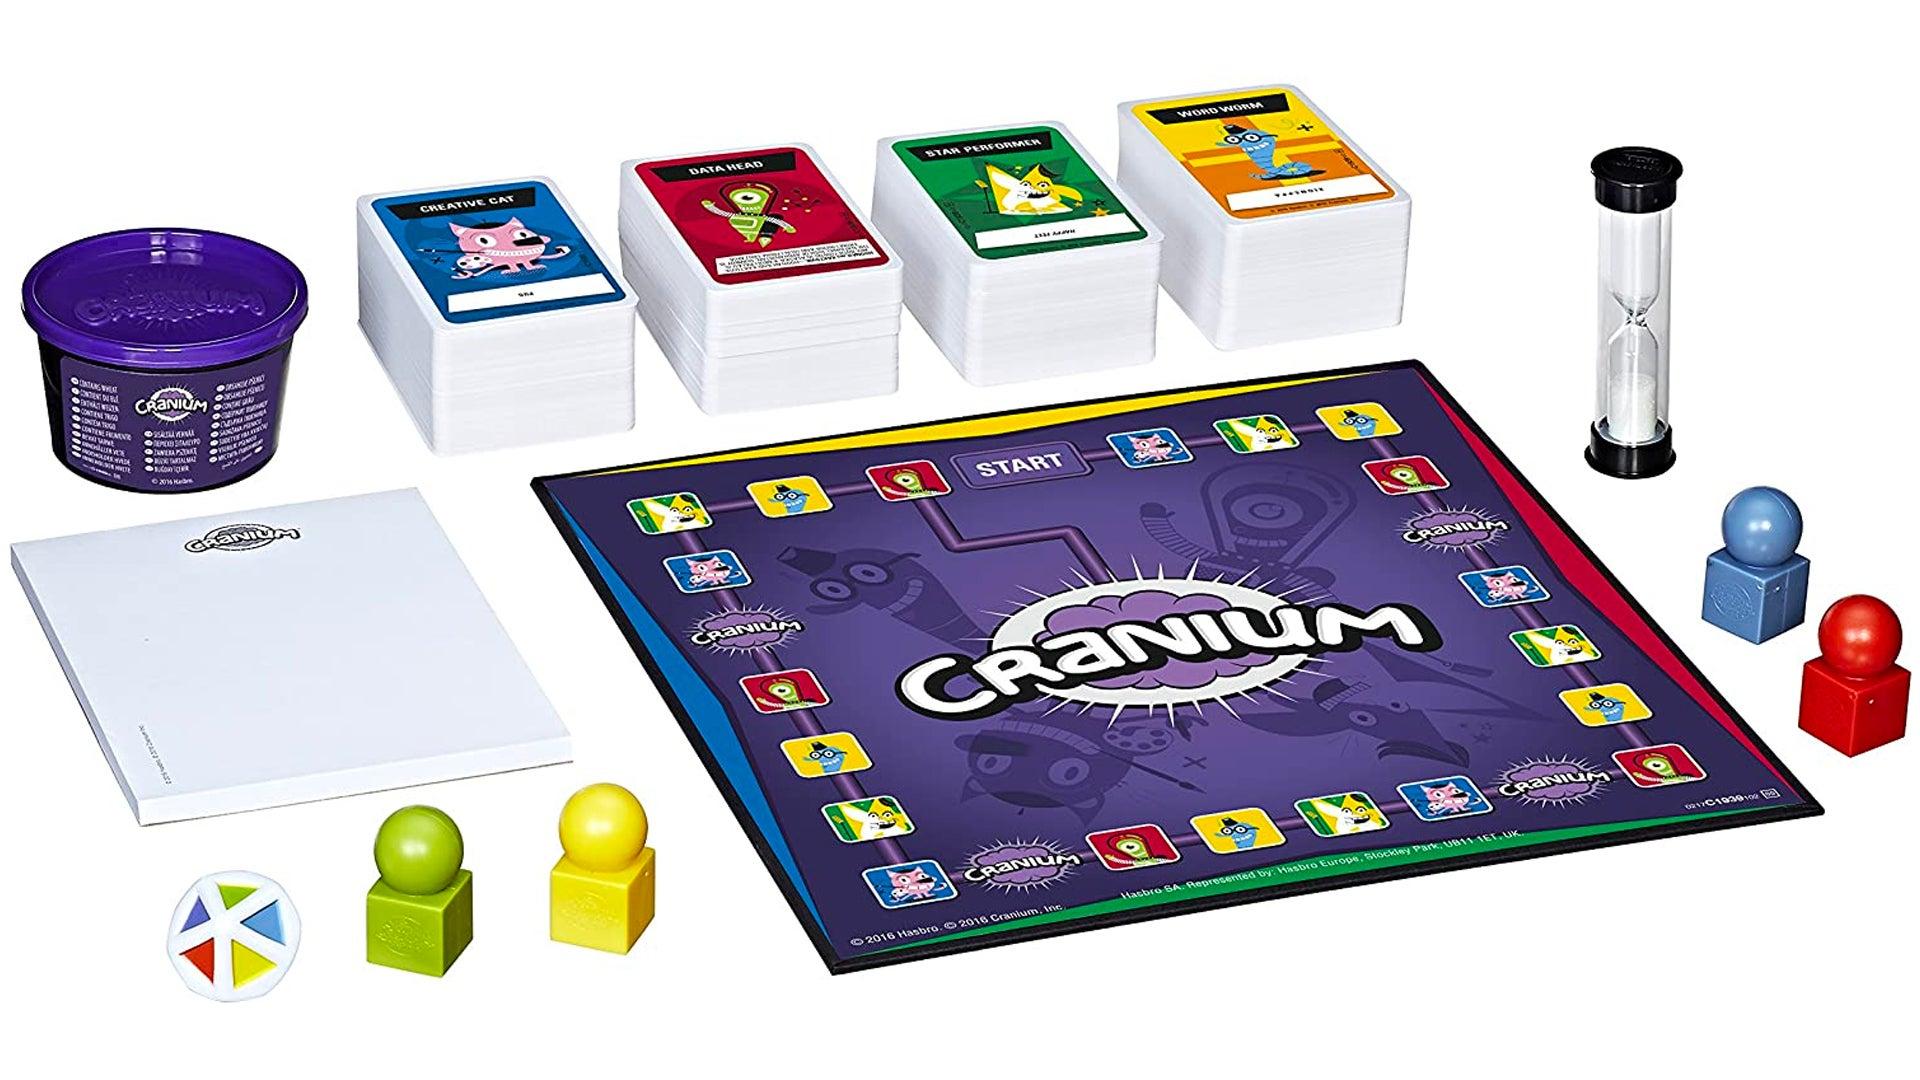 cranium-board-game-gameplay-layout.jpg